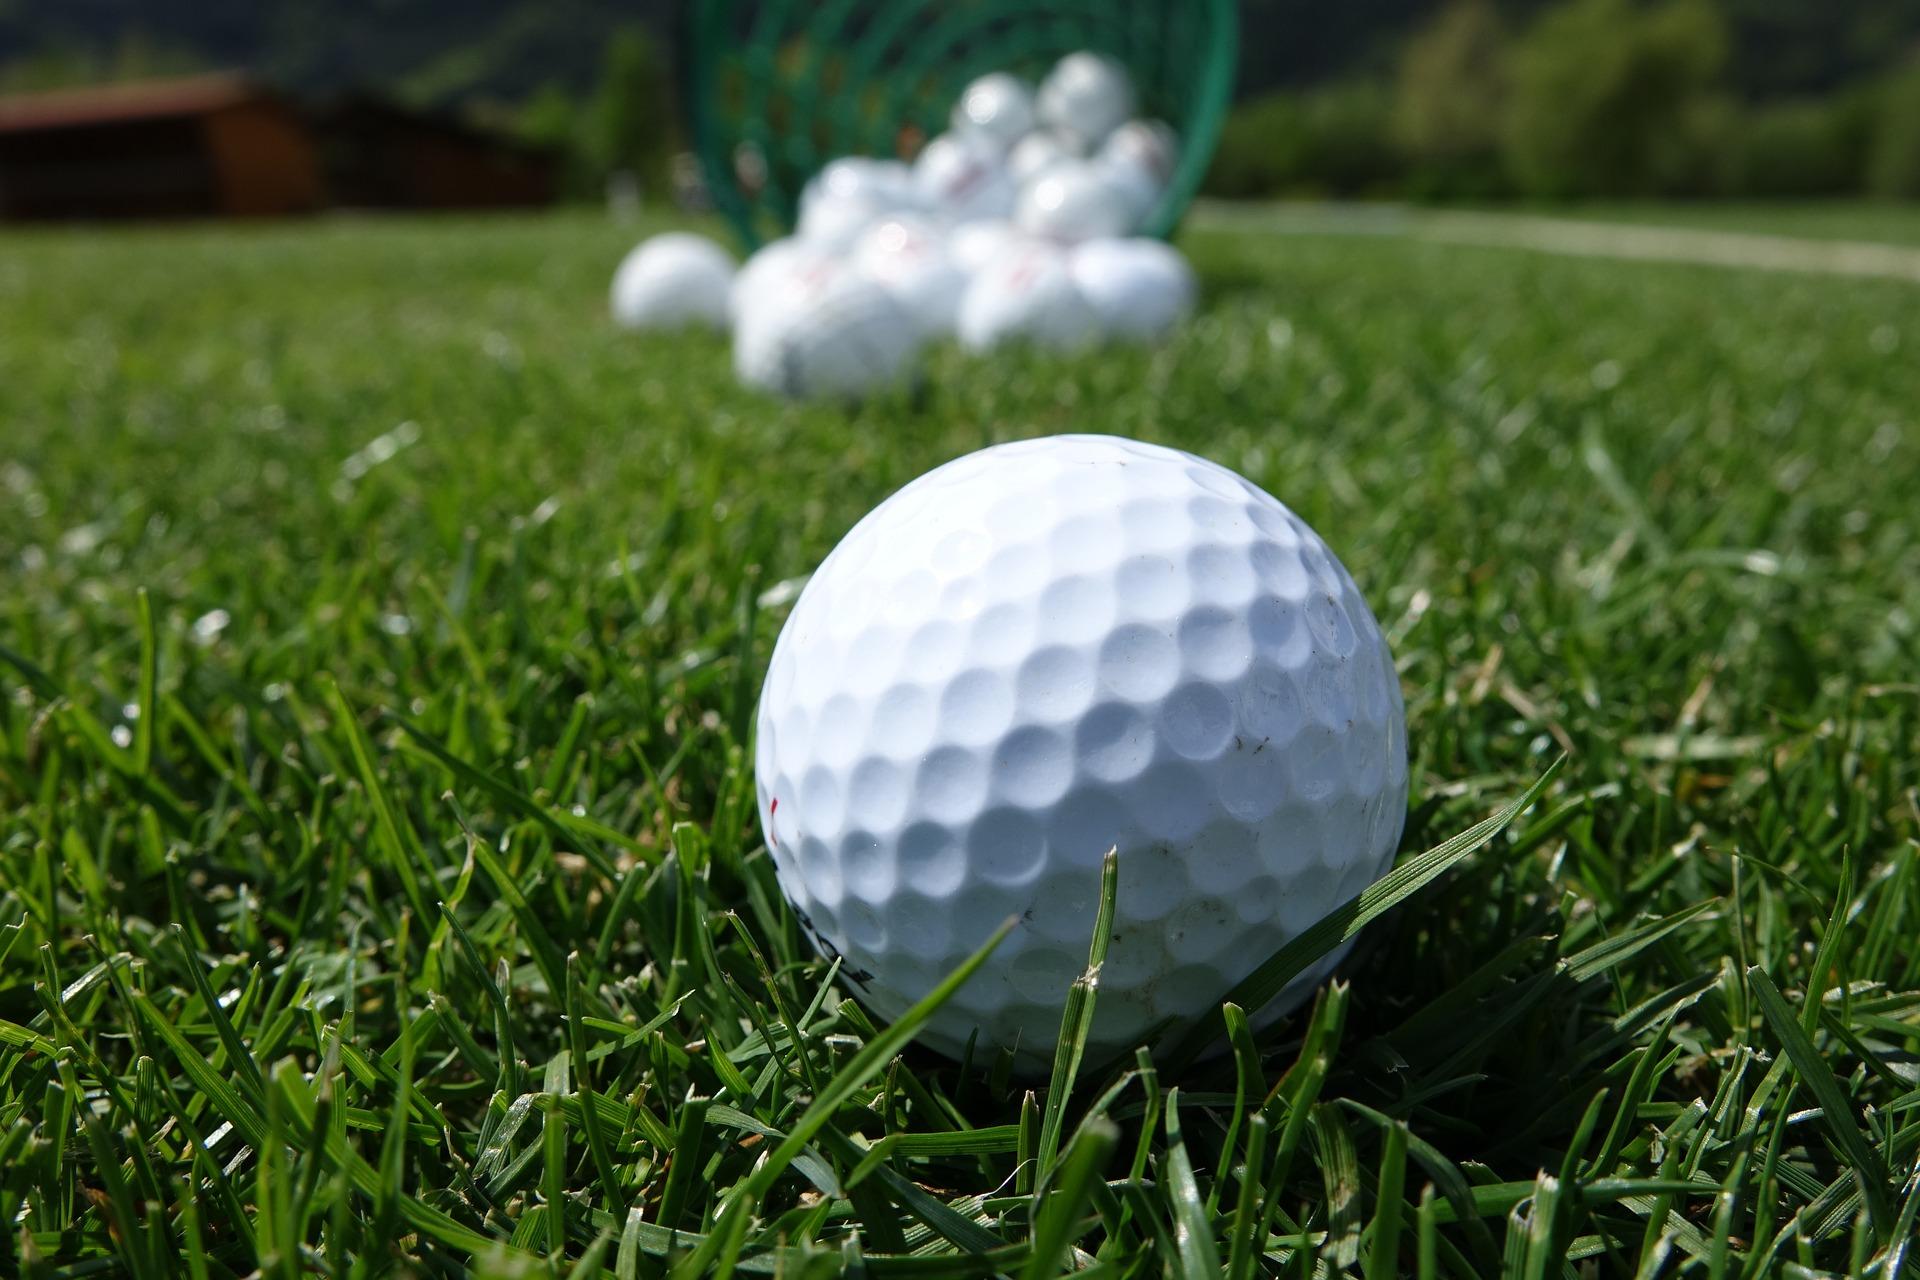 golf-2461348_1920_1505489179363.jpg